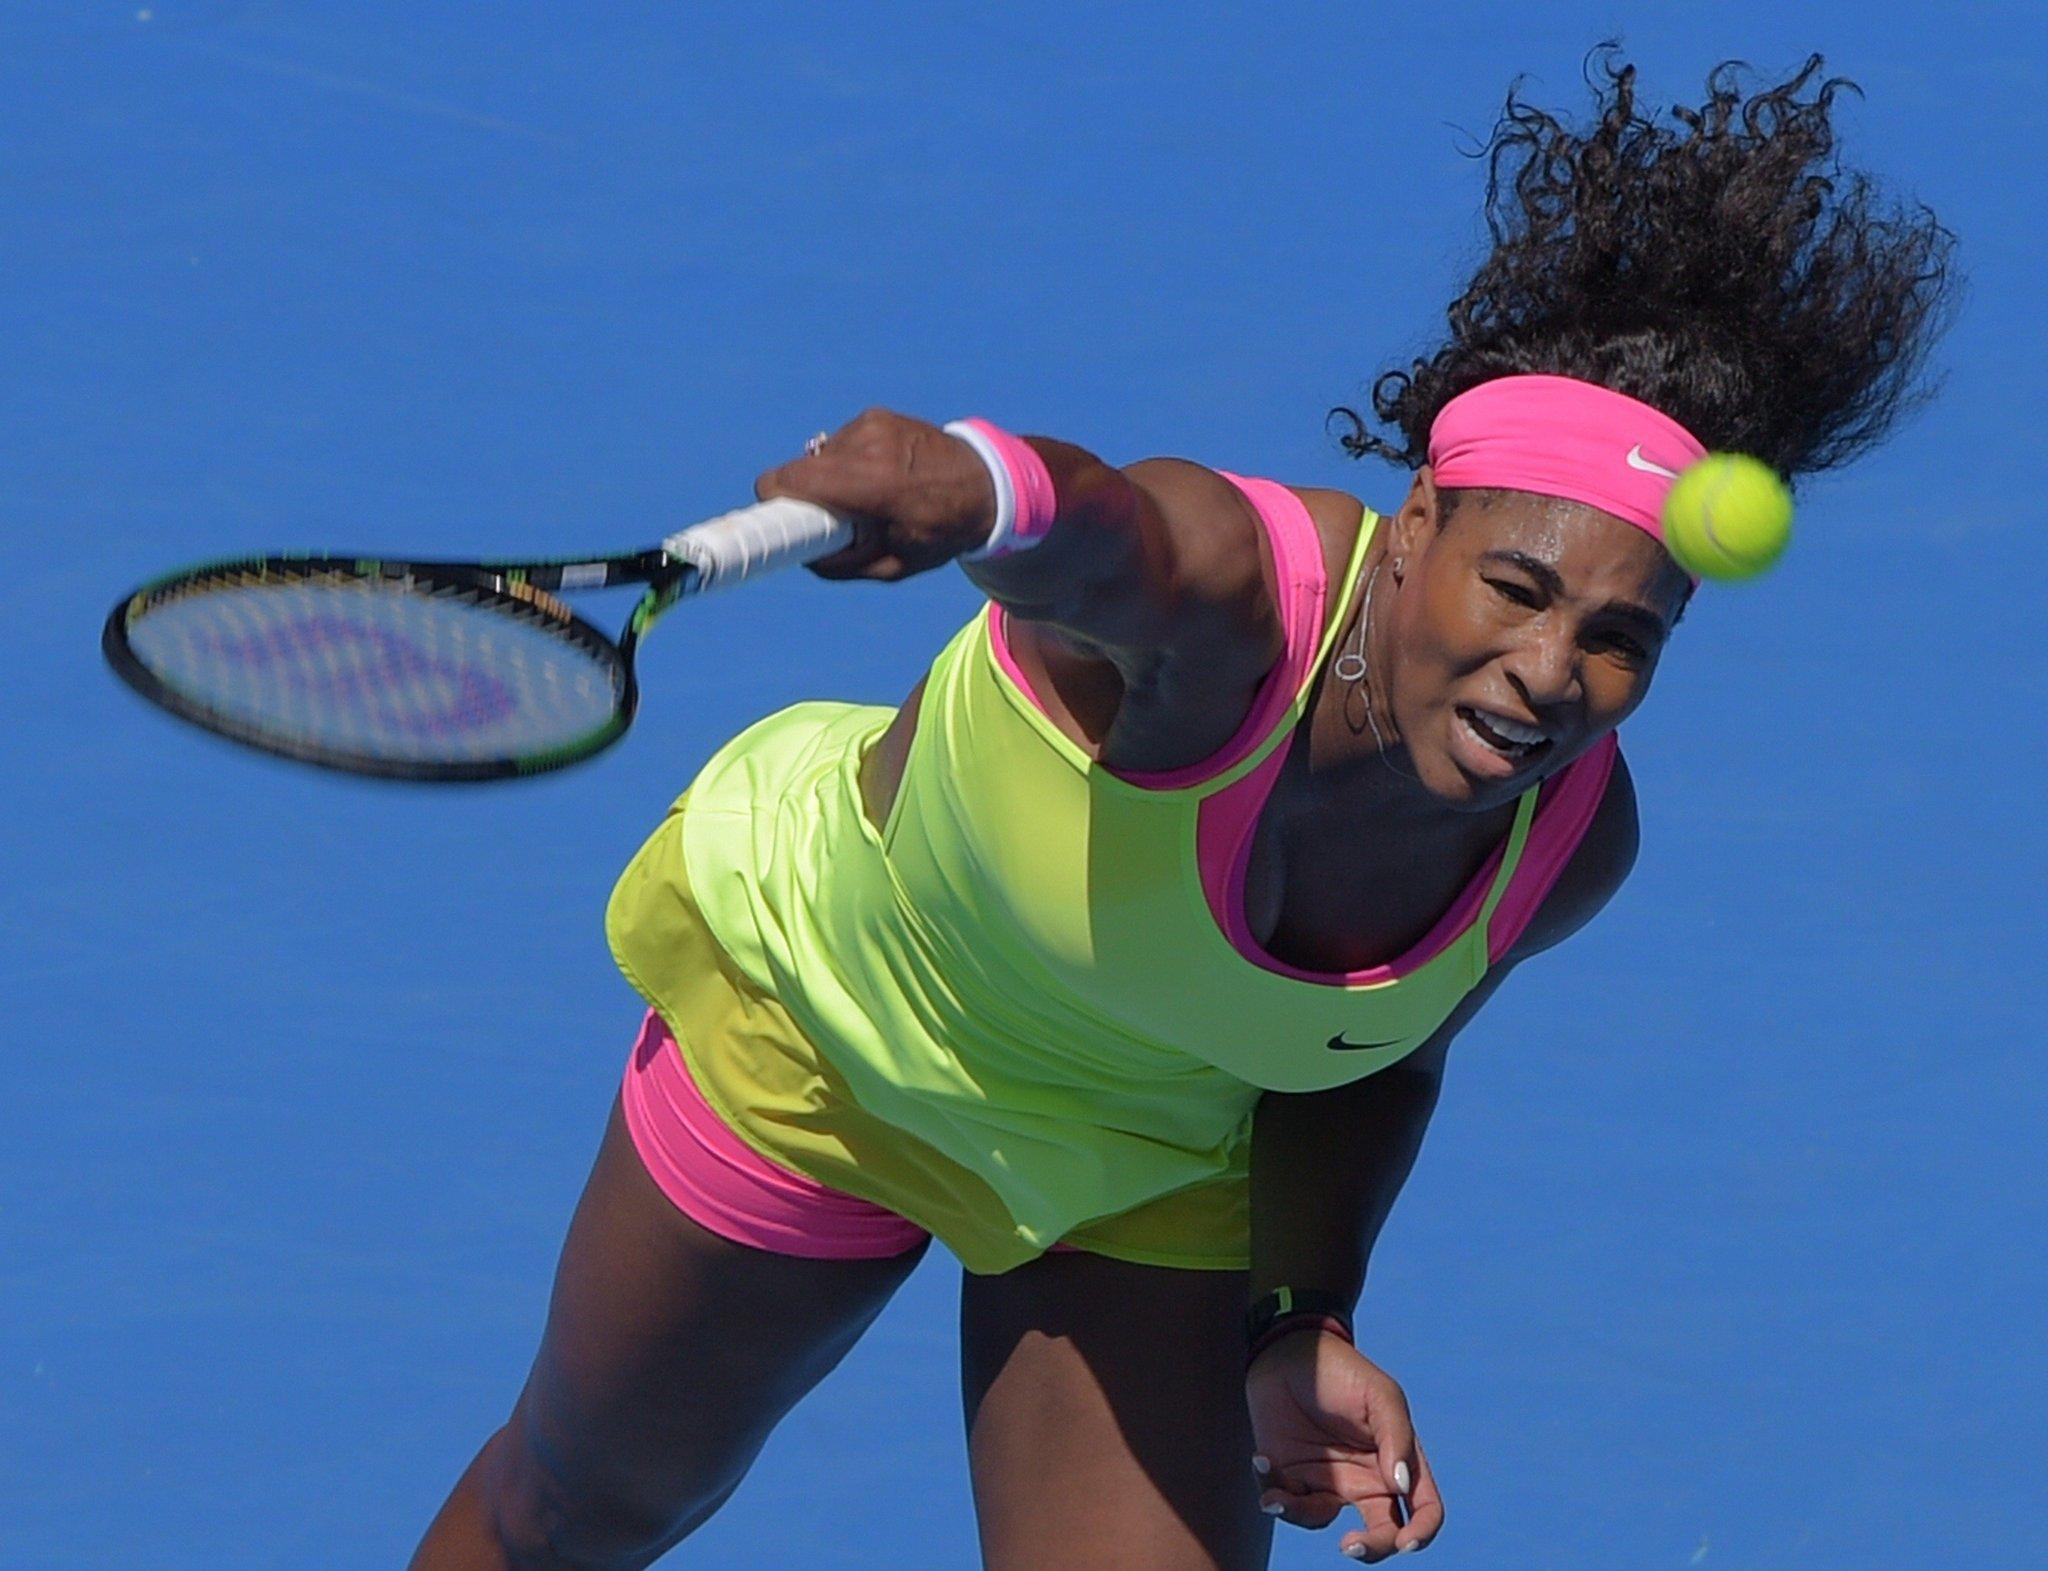 Serena Williams, Novak Djokovic advance at Australian Open - Chicago Tribune